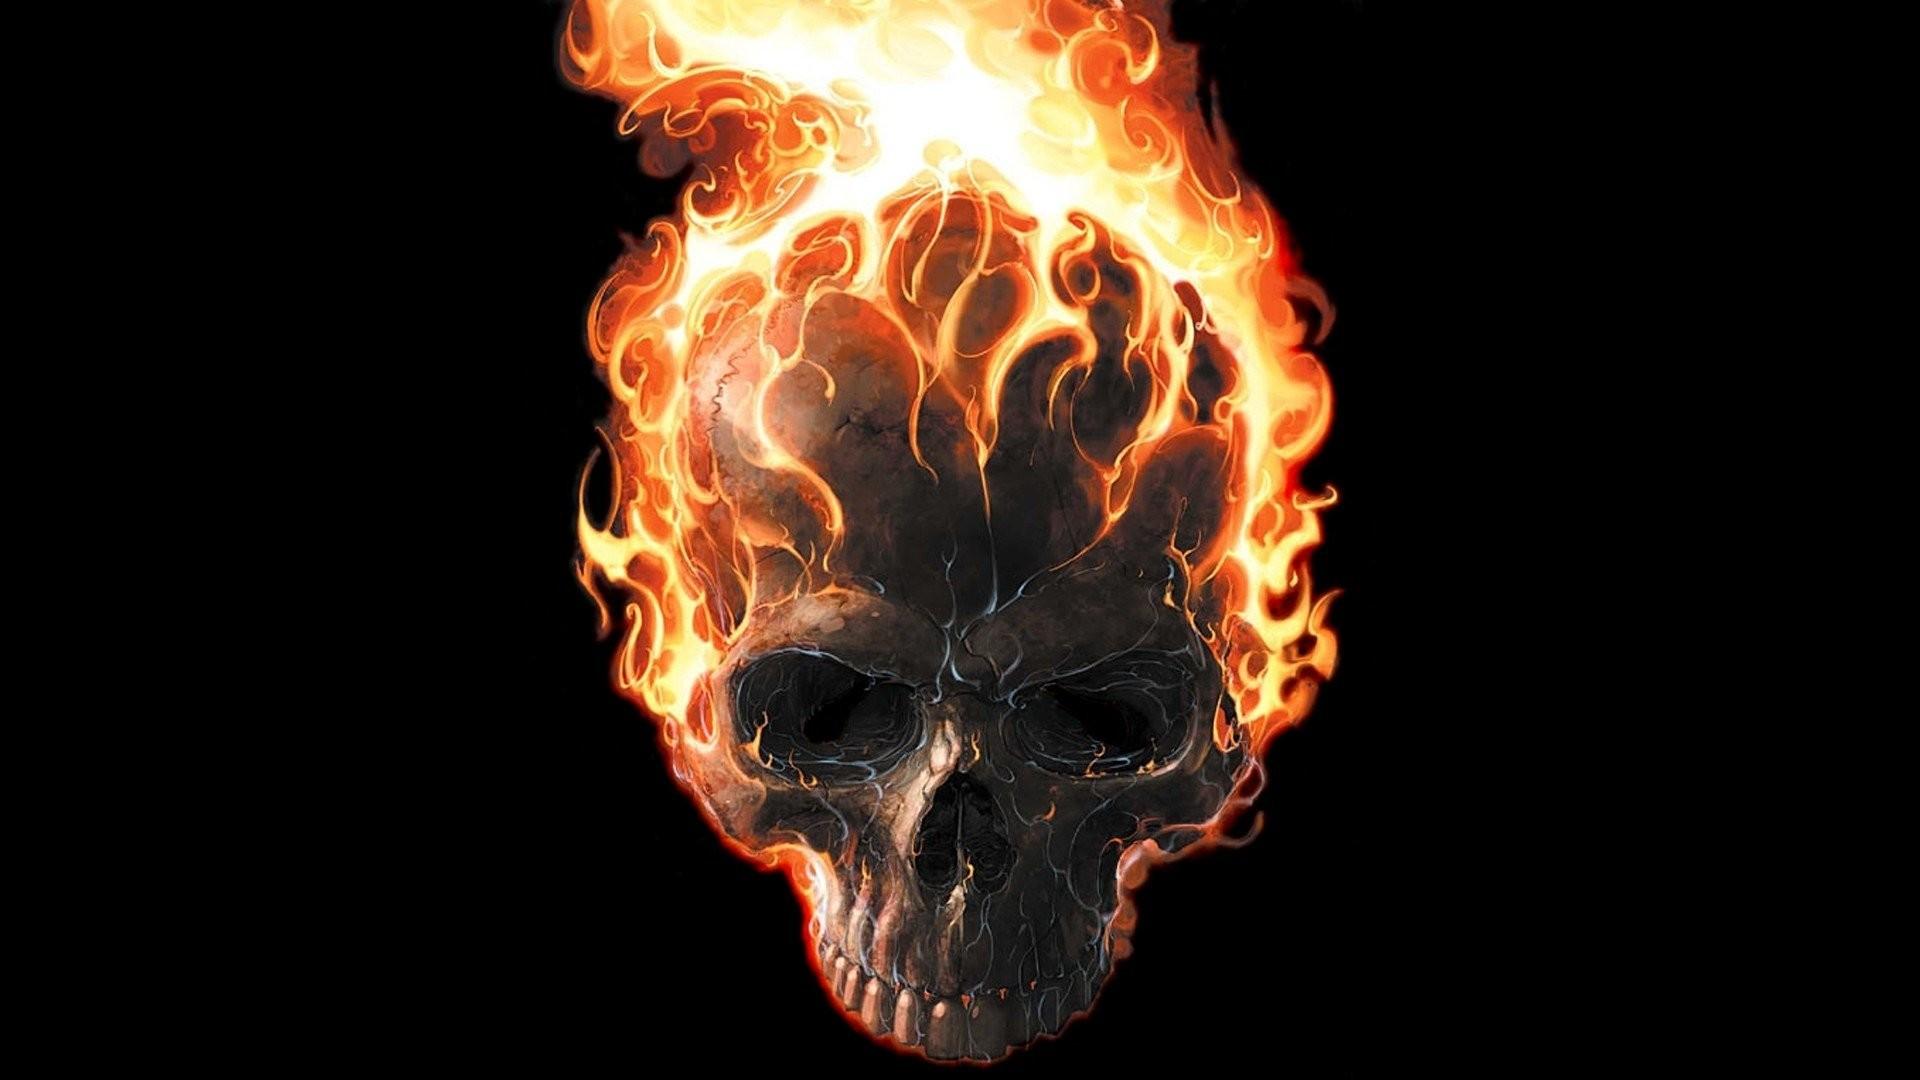 58 flaming skulls